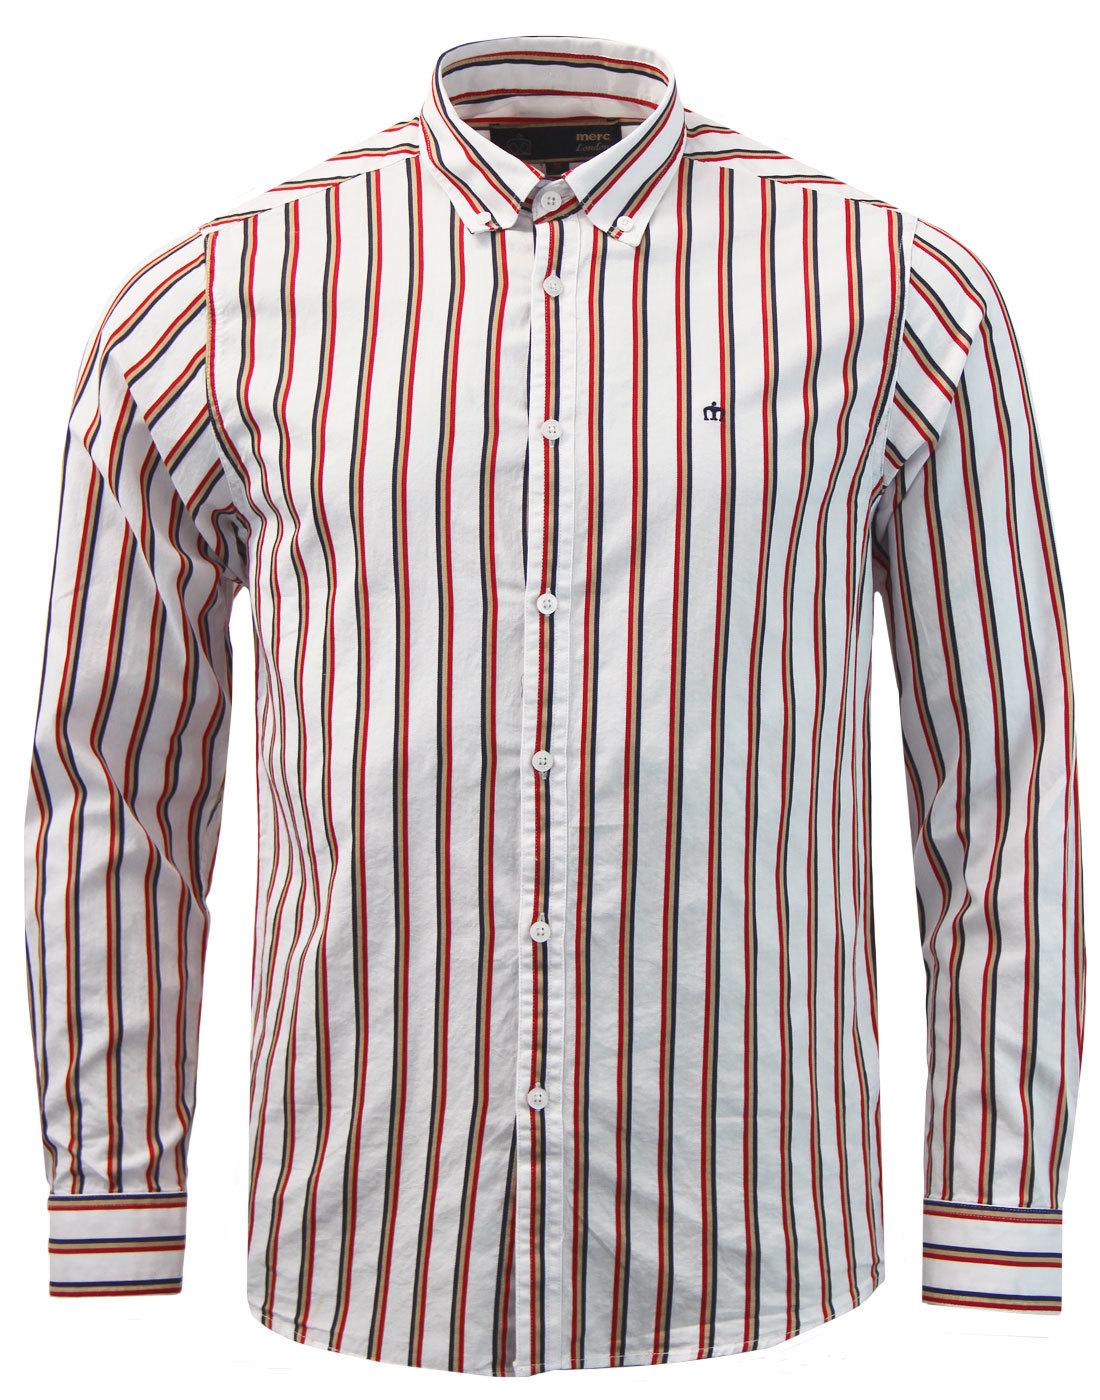 Elsted MERC 60s Mod Regatta Stripe Smart Shirt (W)